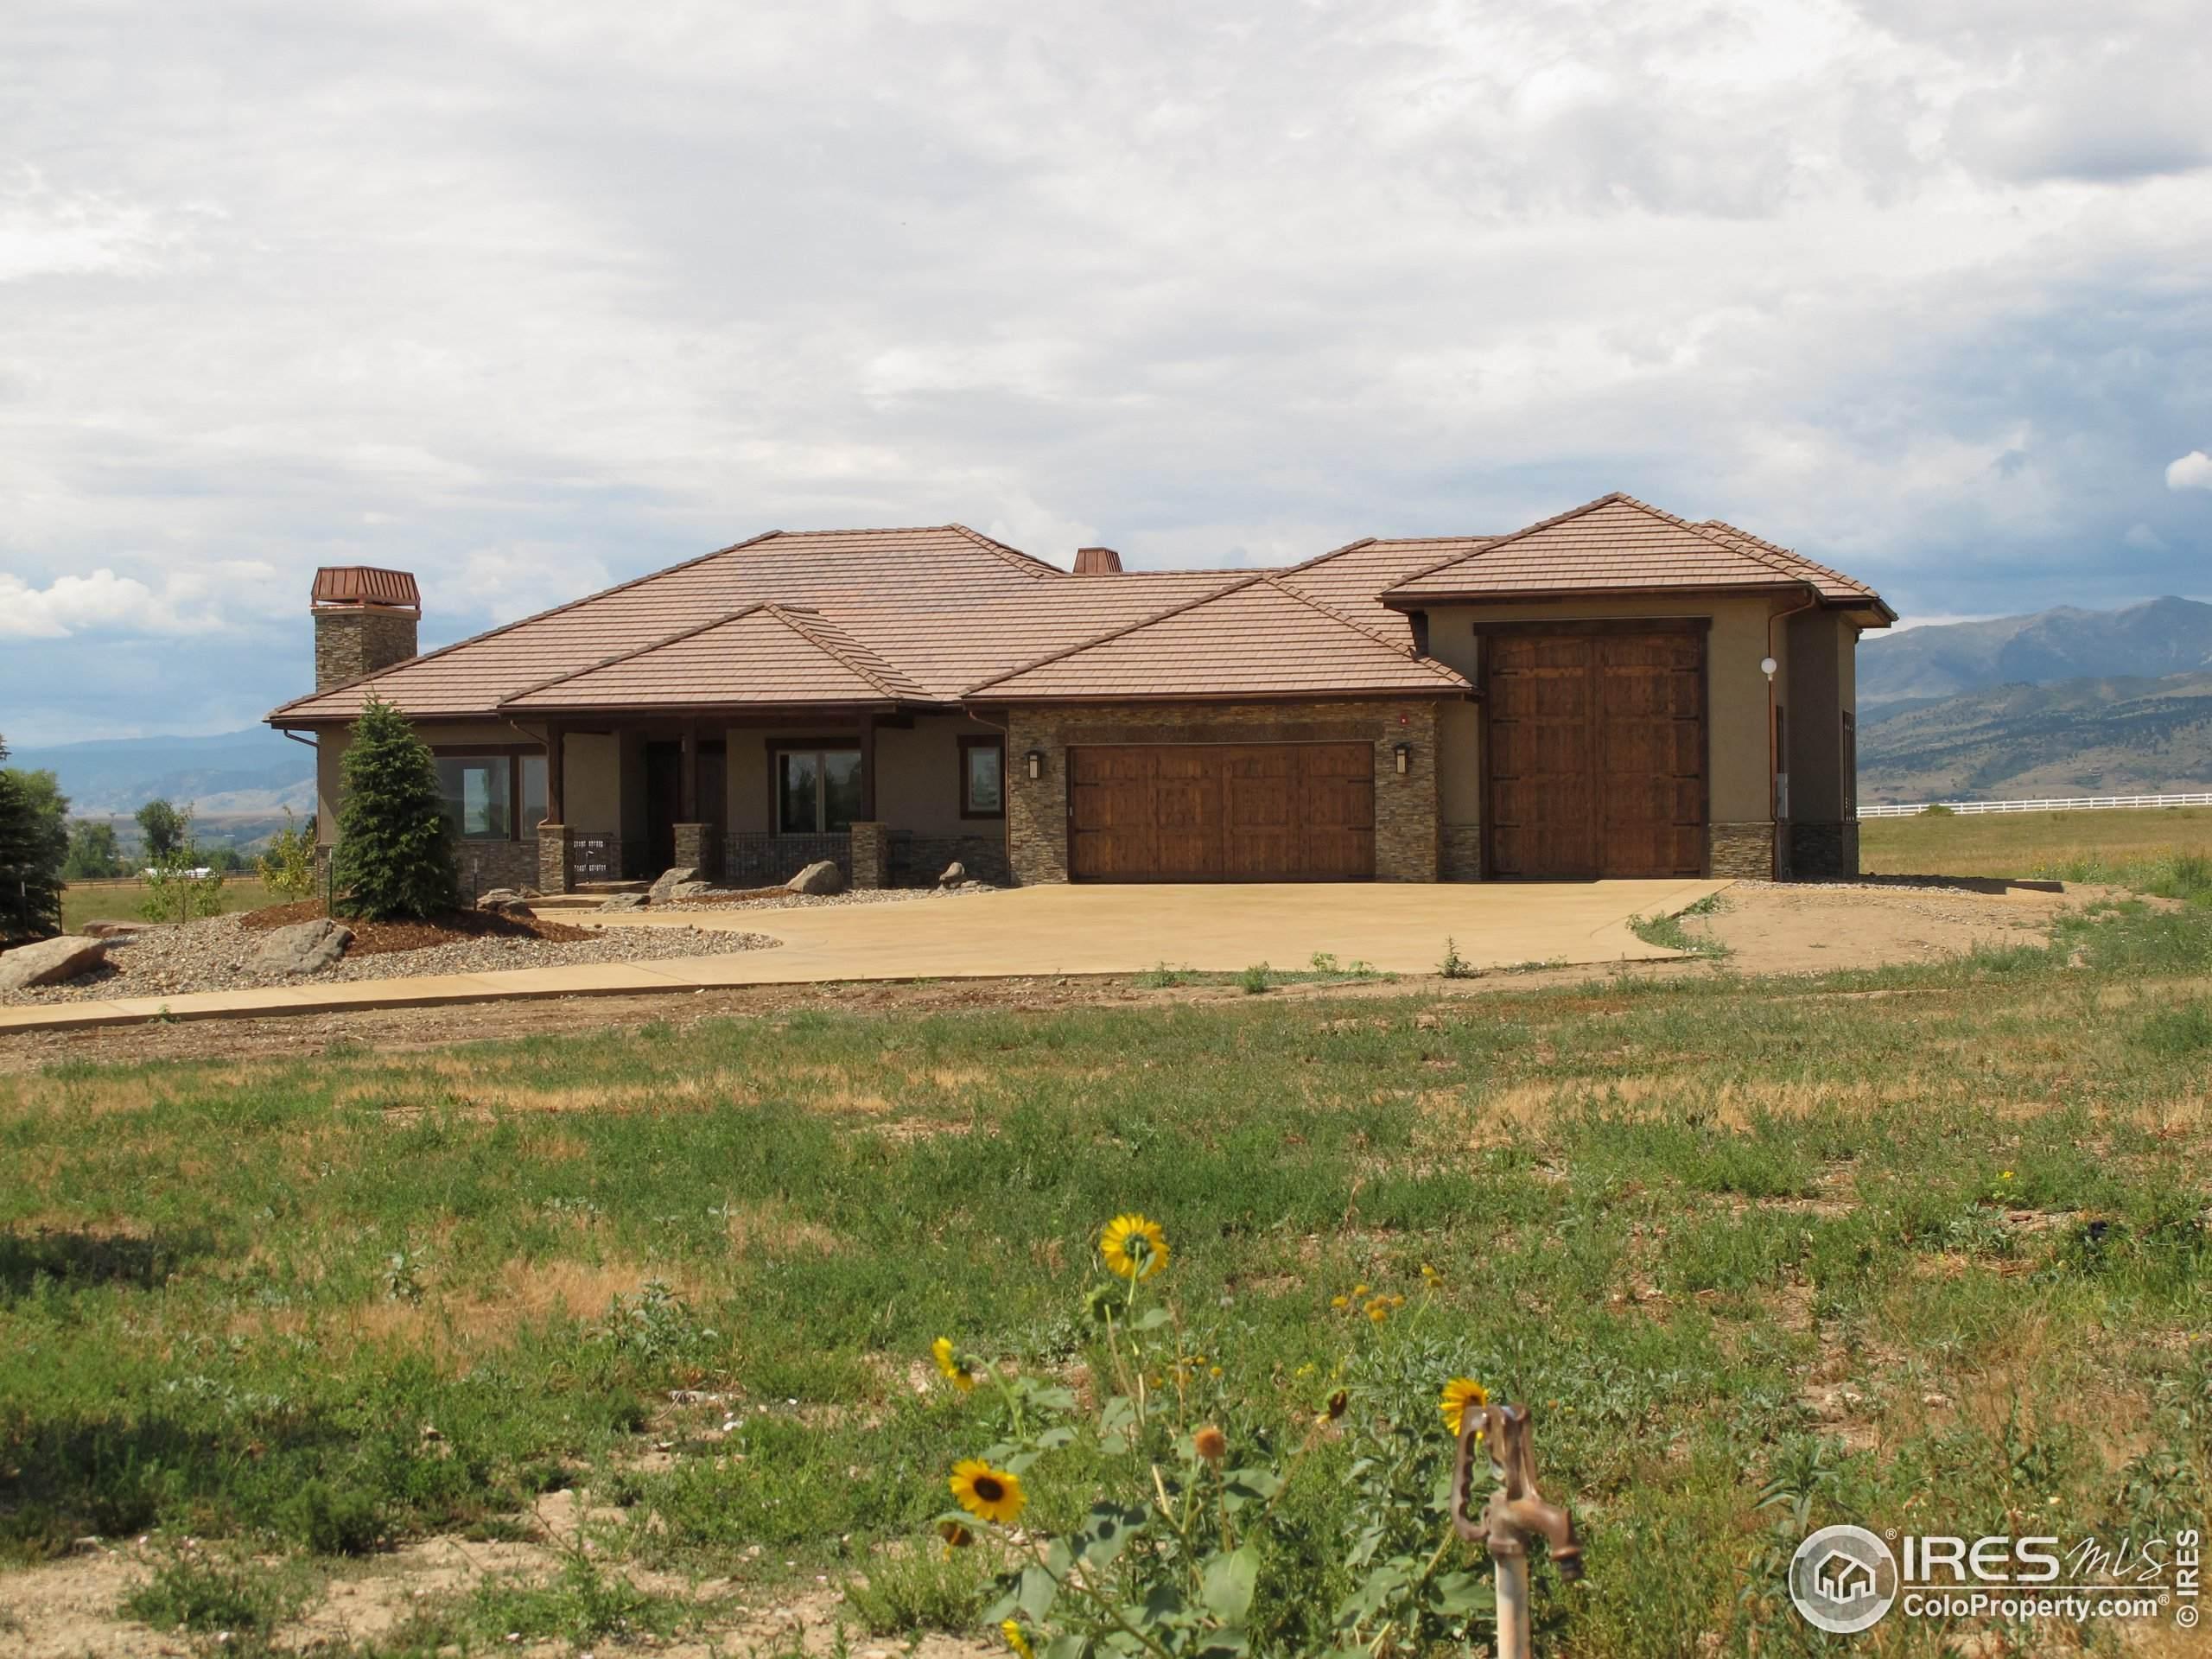 1205 Red Ash Ln, Boulder, CO 80303 (MLS #937306) :: RE/MAX Alliance